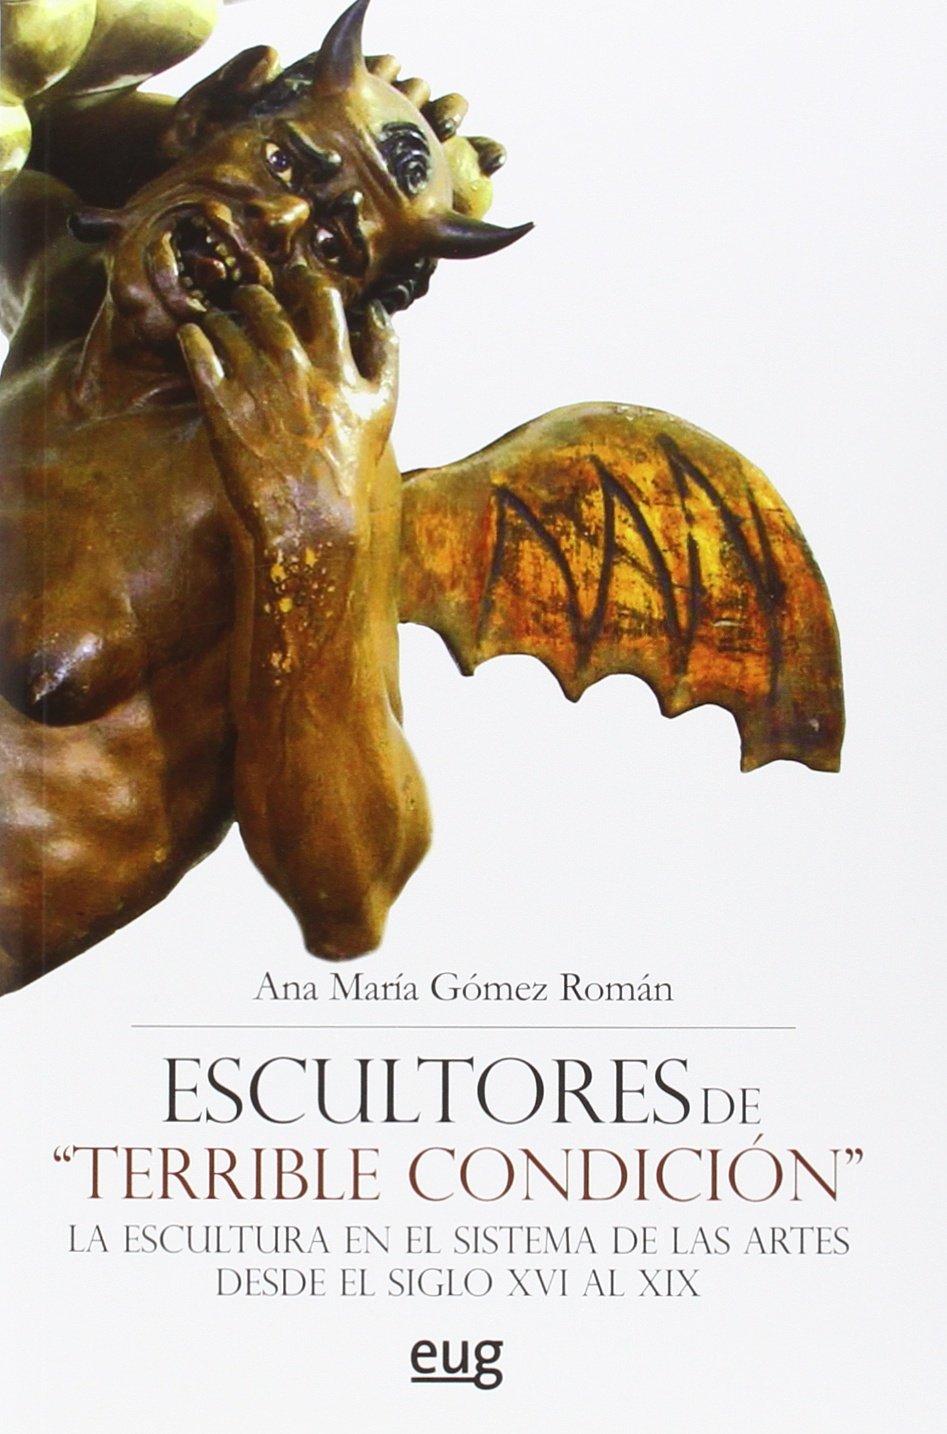 ESCULTORES DE TERRIBLE CONDICIÓN (Colección Arte y Arqueología) Tapa blanda – 17 dic 2015 ANA MARIA GOMEZ ROMAN 8433858173 Modern period c 1500 onwards